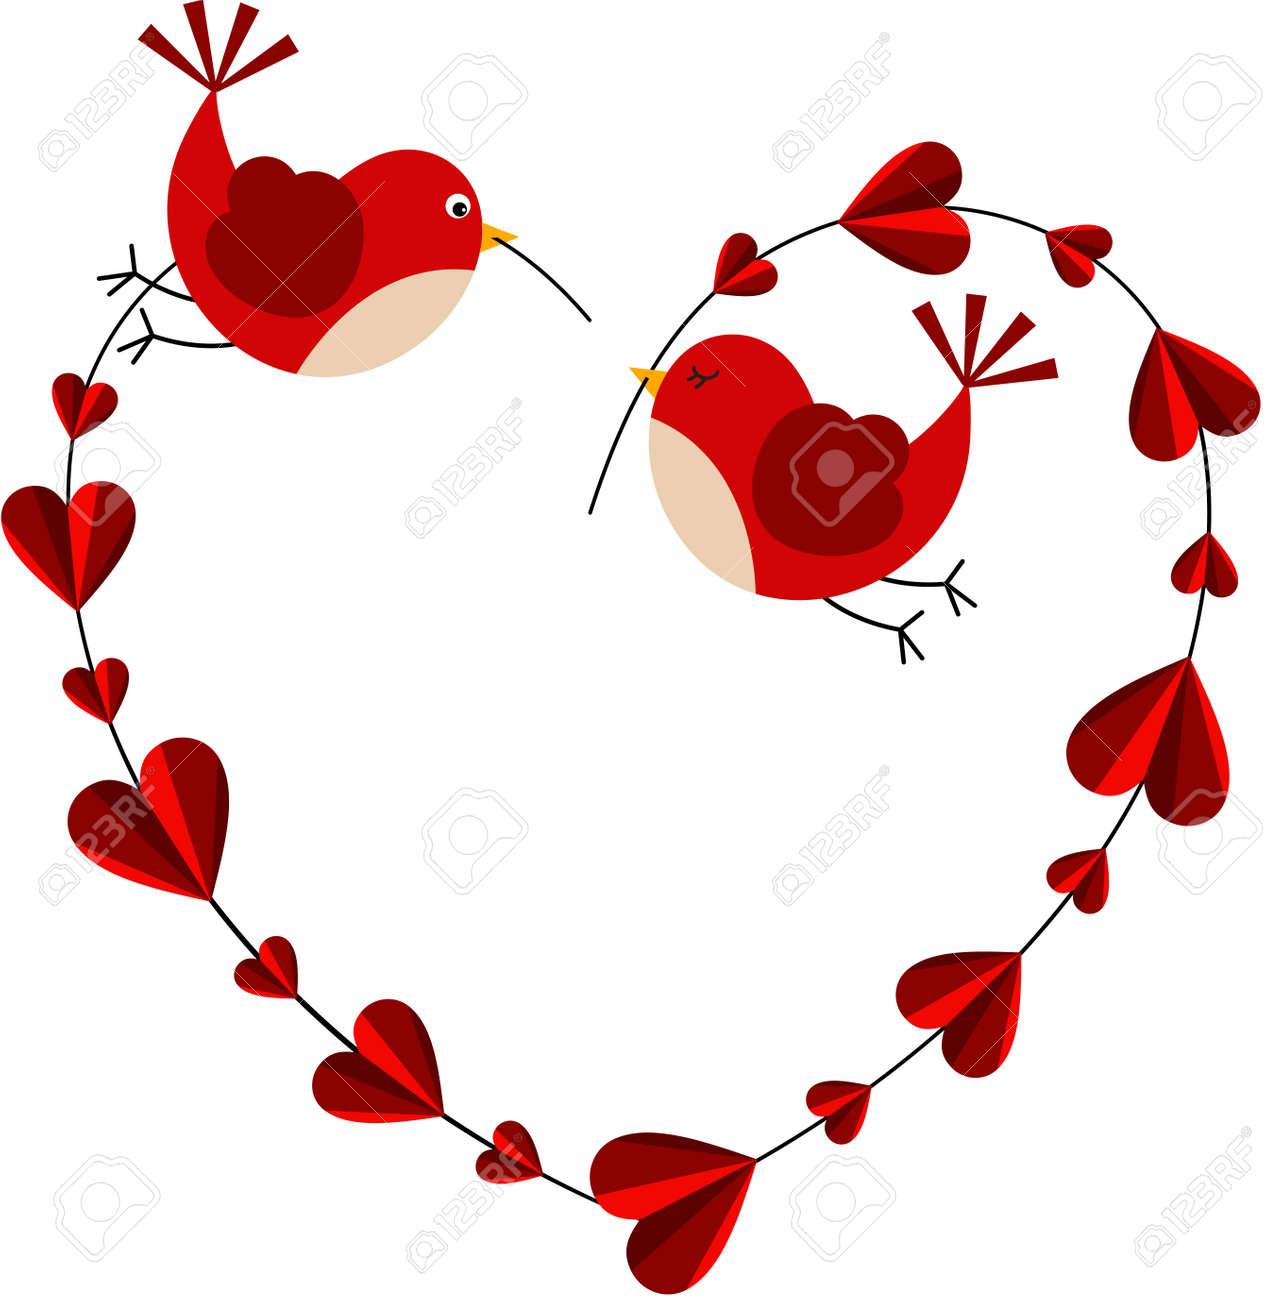 Couple love birds forming a heart - 48827505